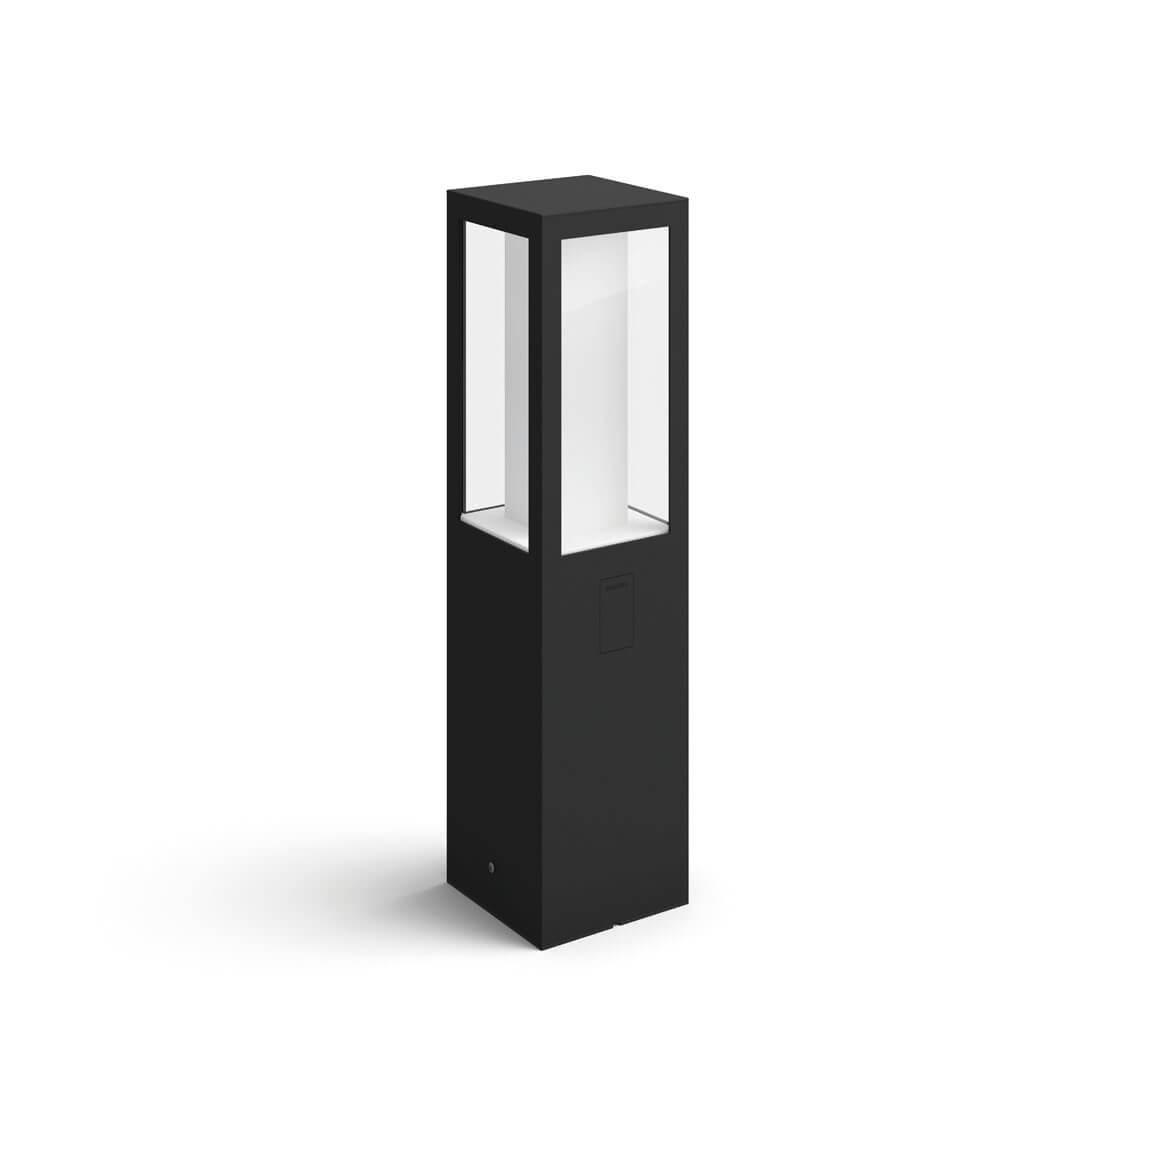 Philips Hue LED Sockelleuchte Impress - Schwarz